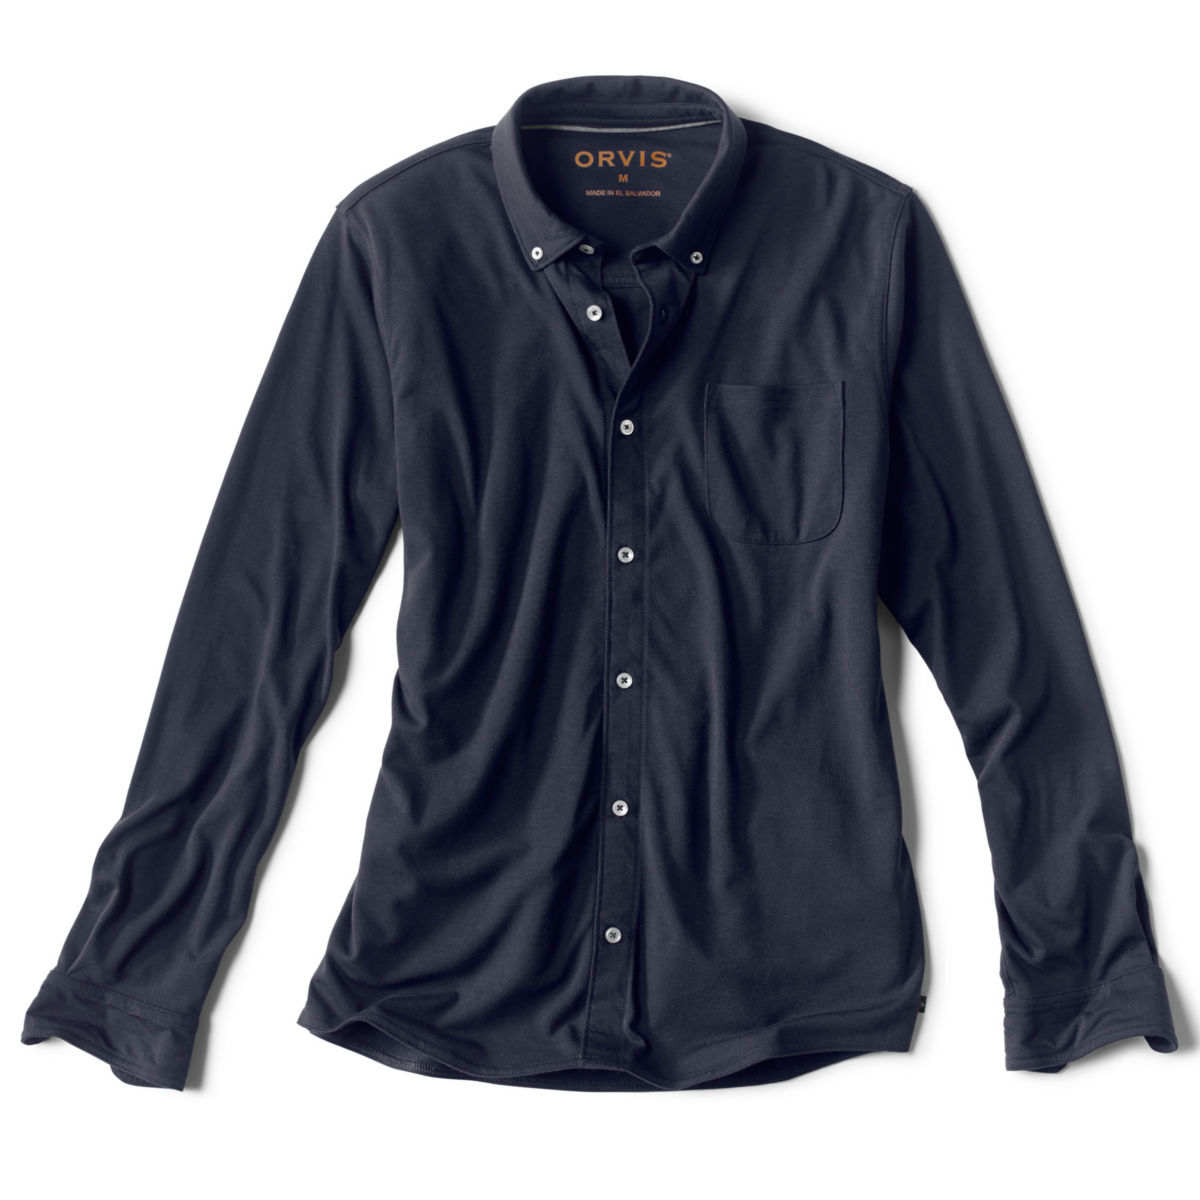 Ridge drirelease® Knit Shirt - image number 0